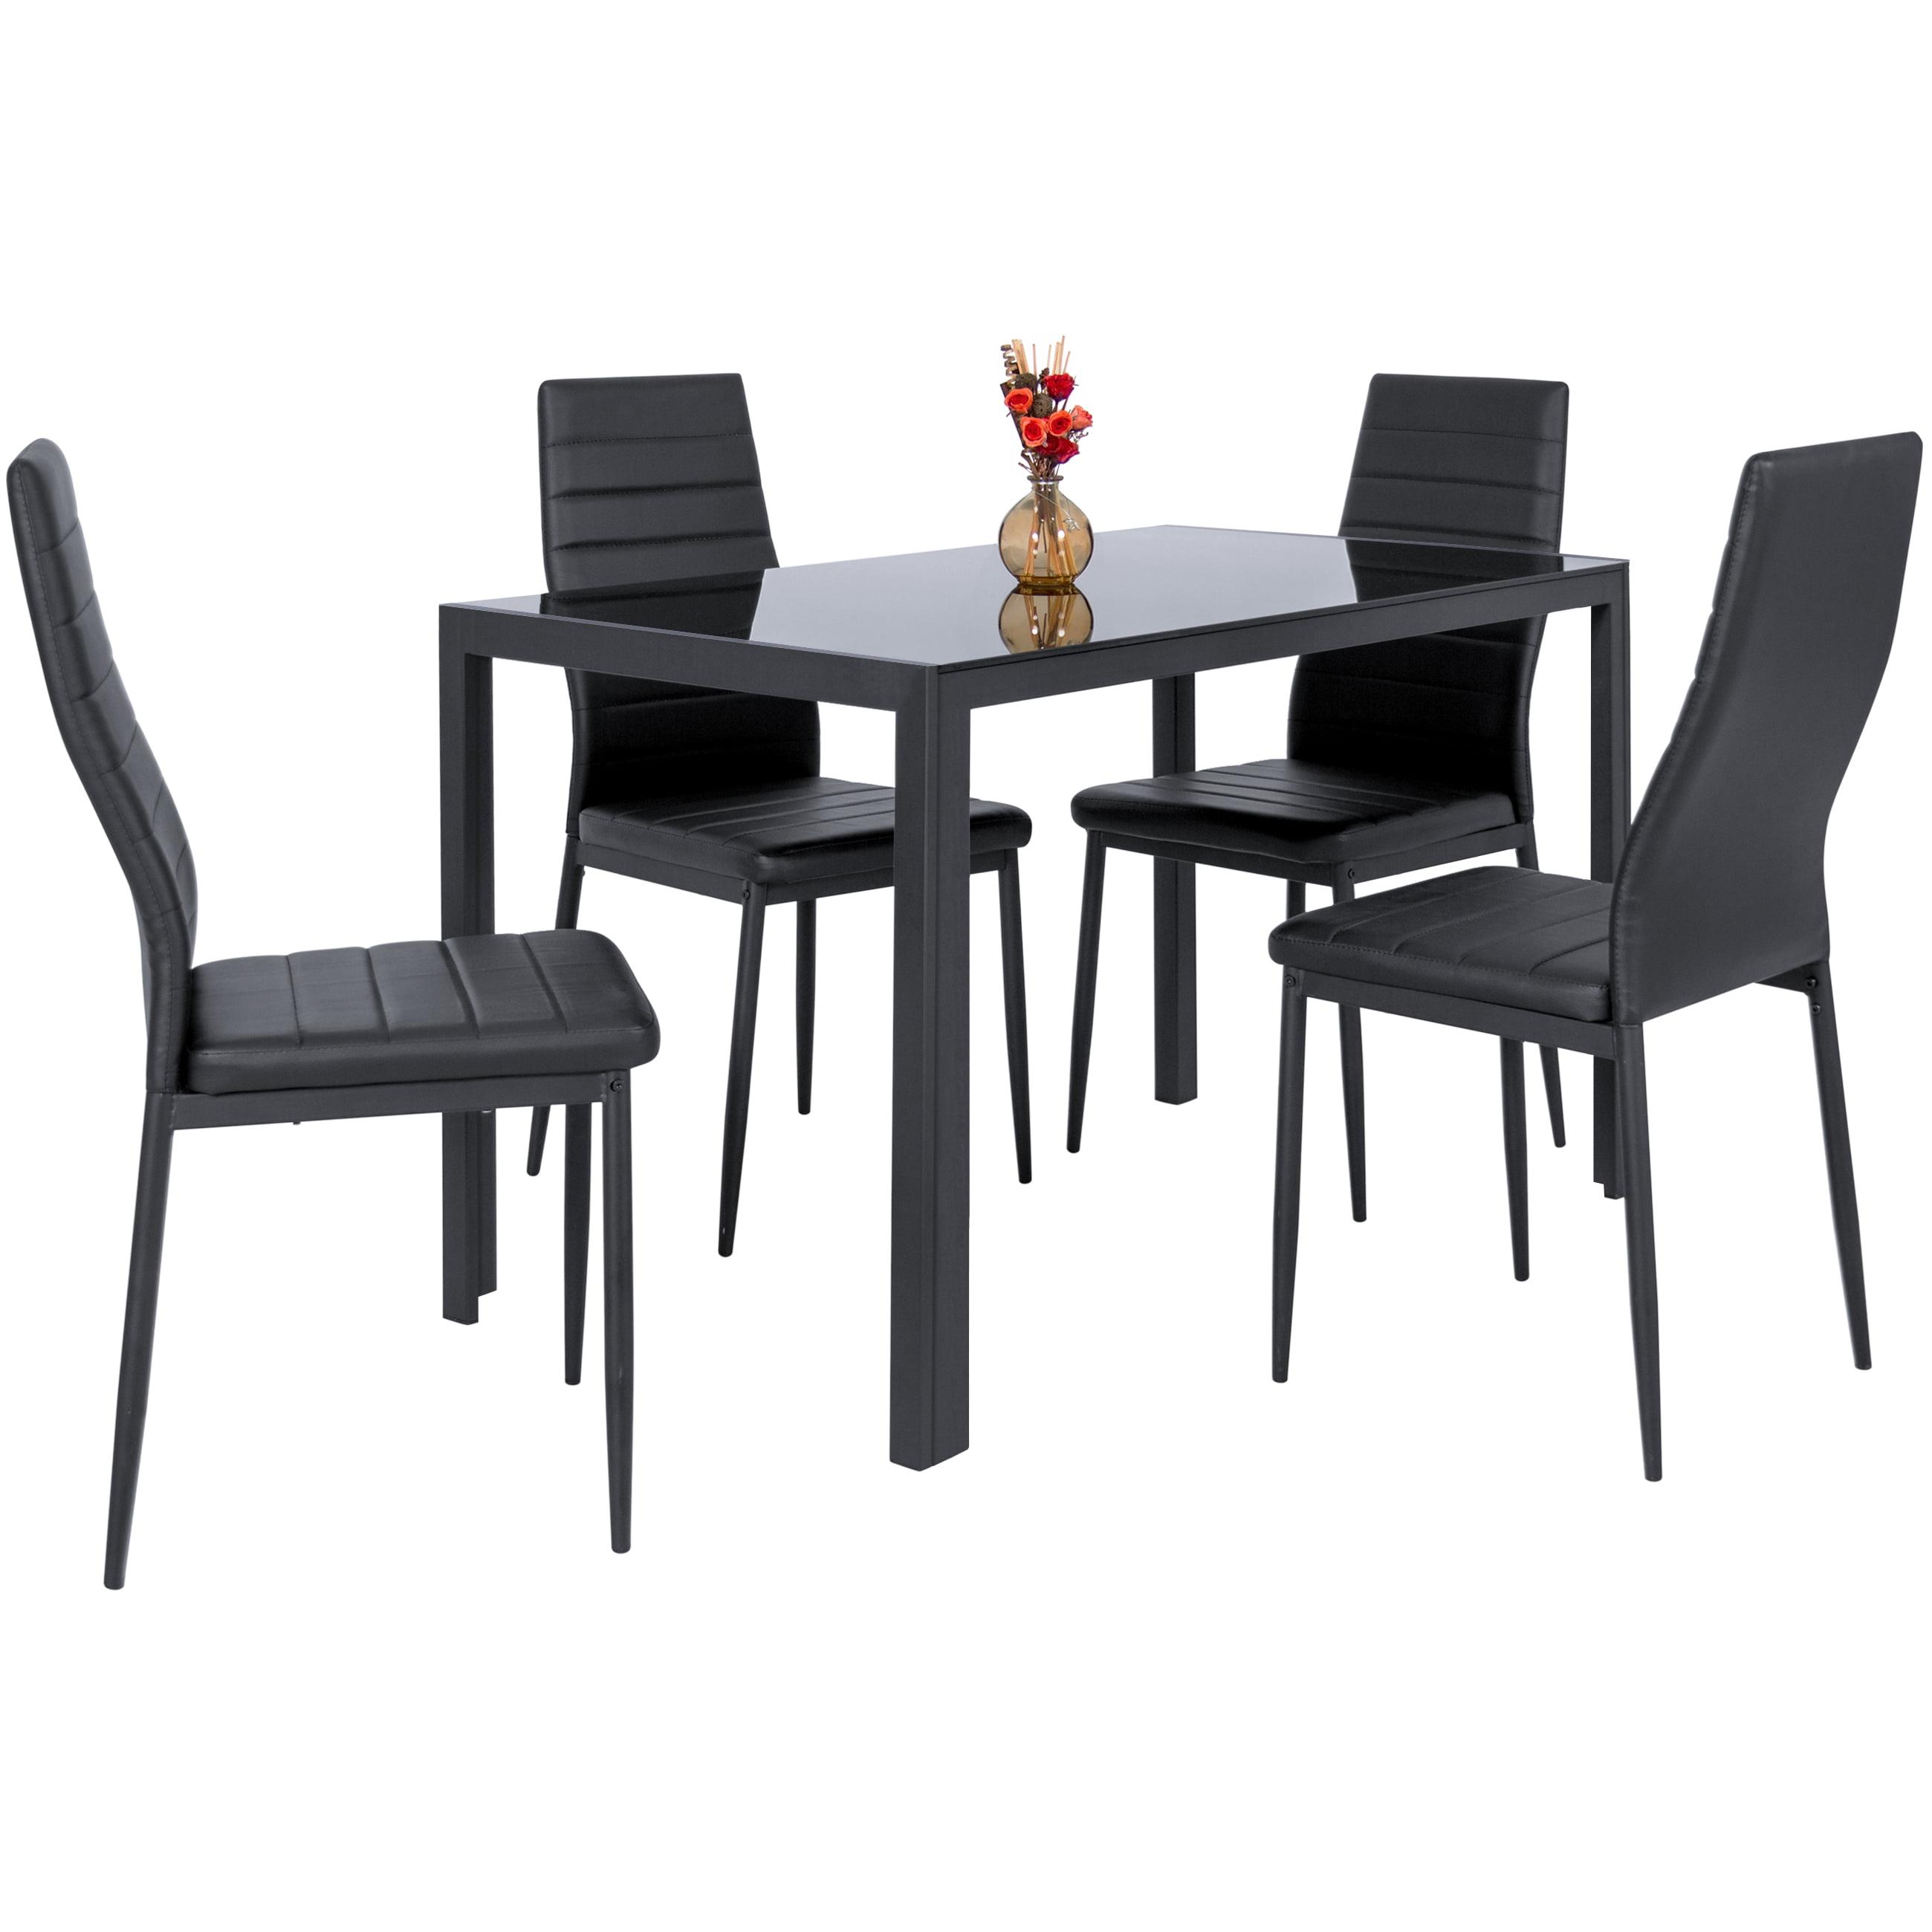 Zimtown modern dining table set 4 chair glass metal kitchen room breakfast furniture walmart com